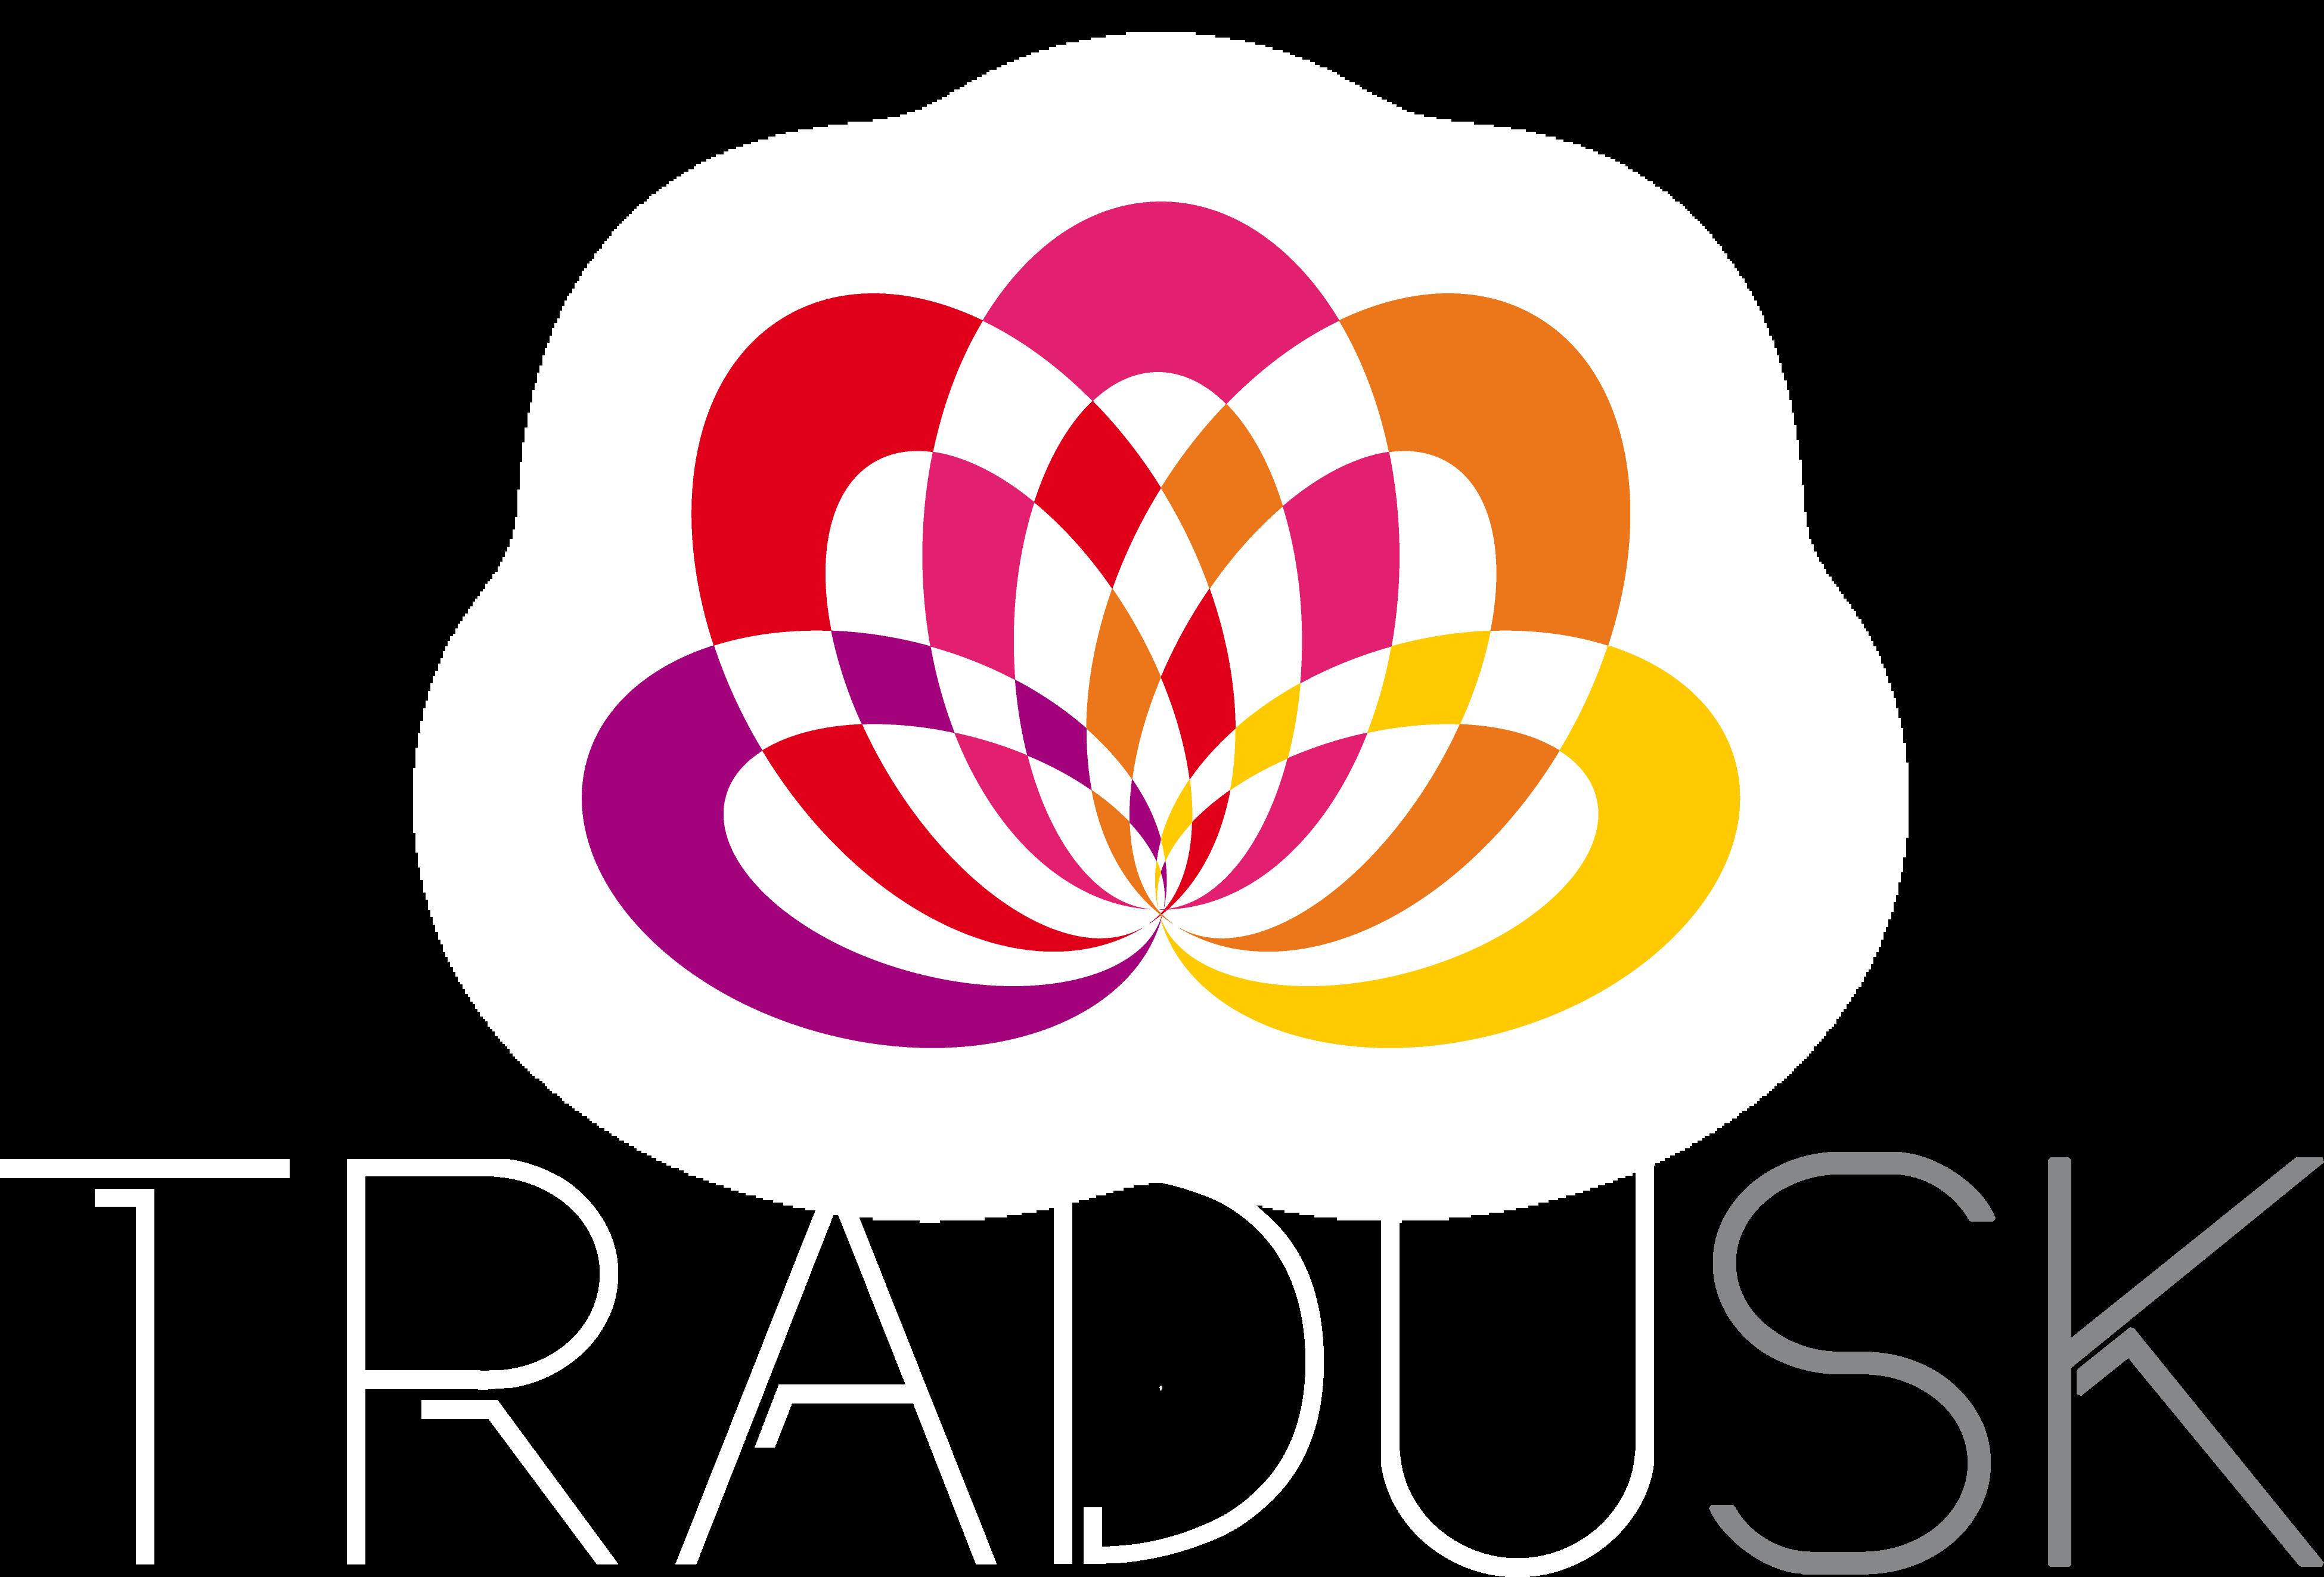 TRADUSK Tradusk – Традюск – переводы Logo